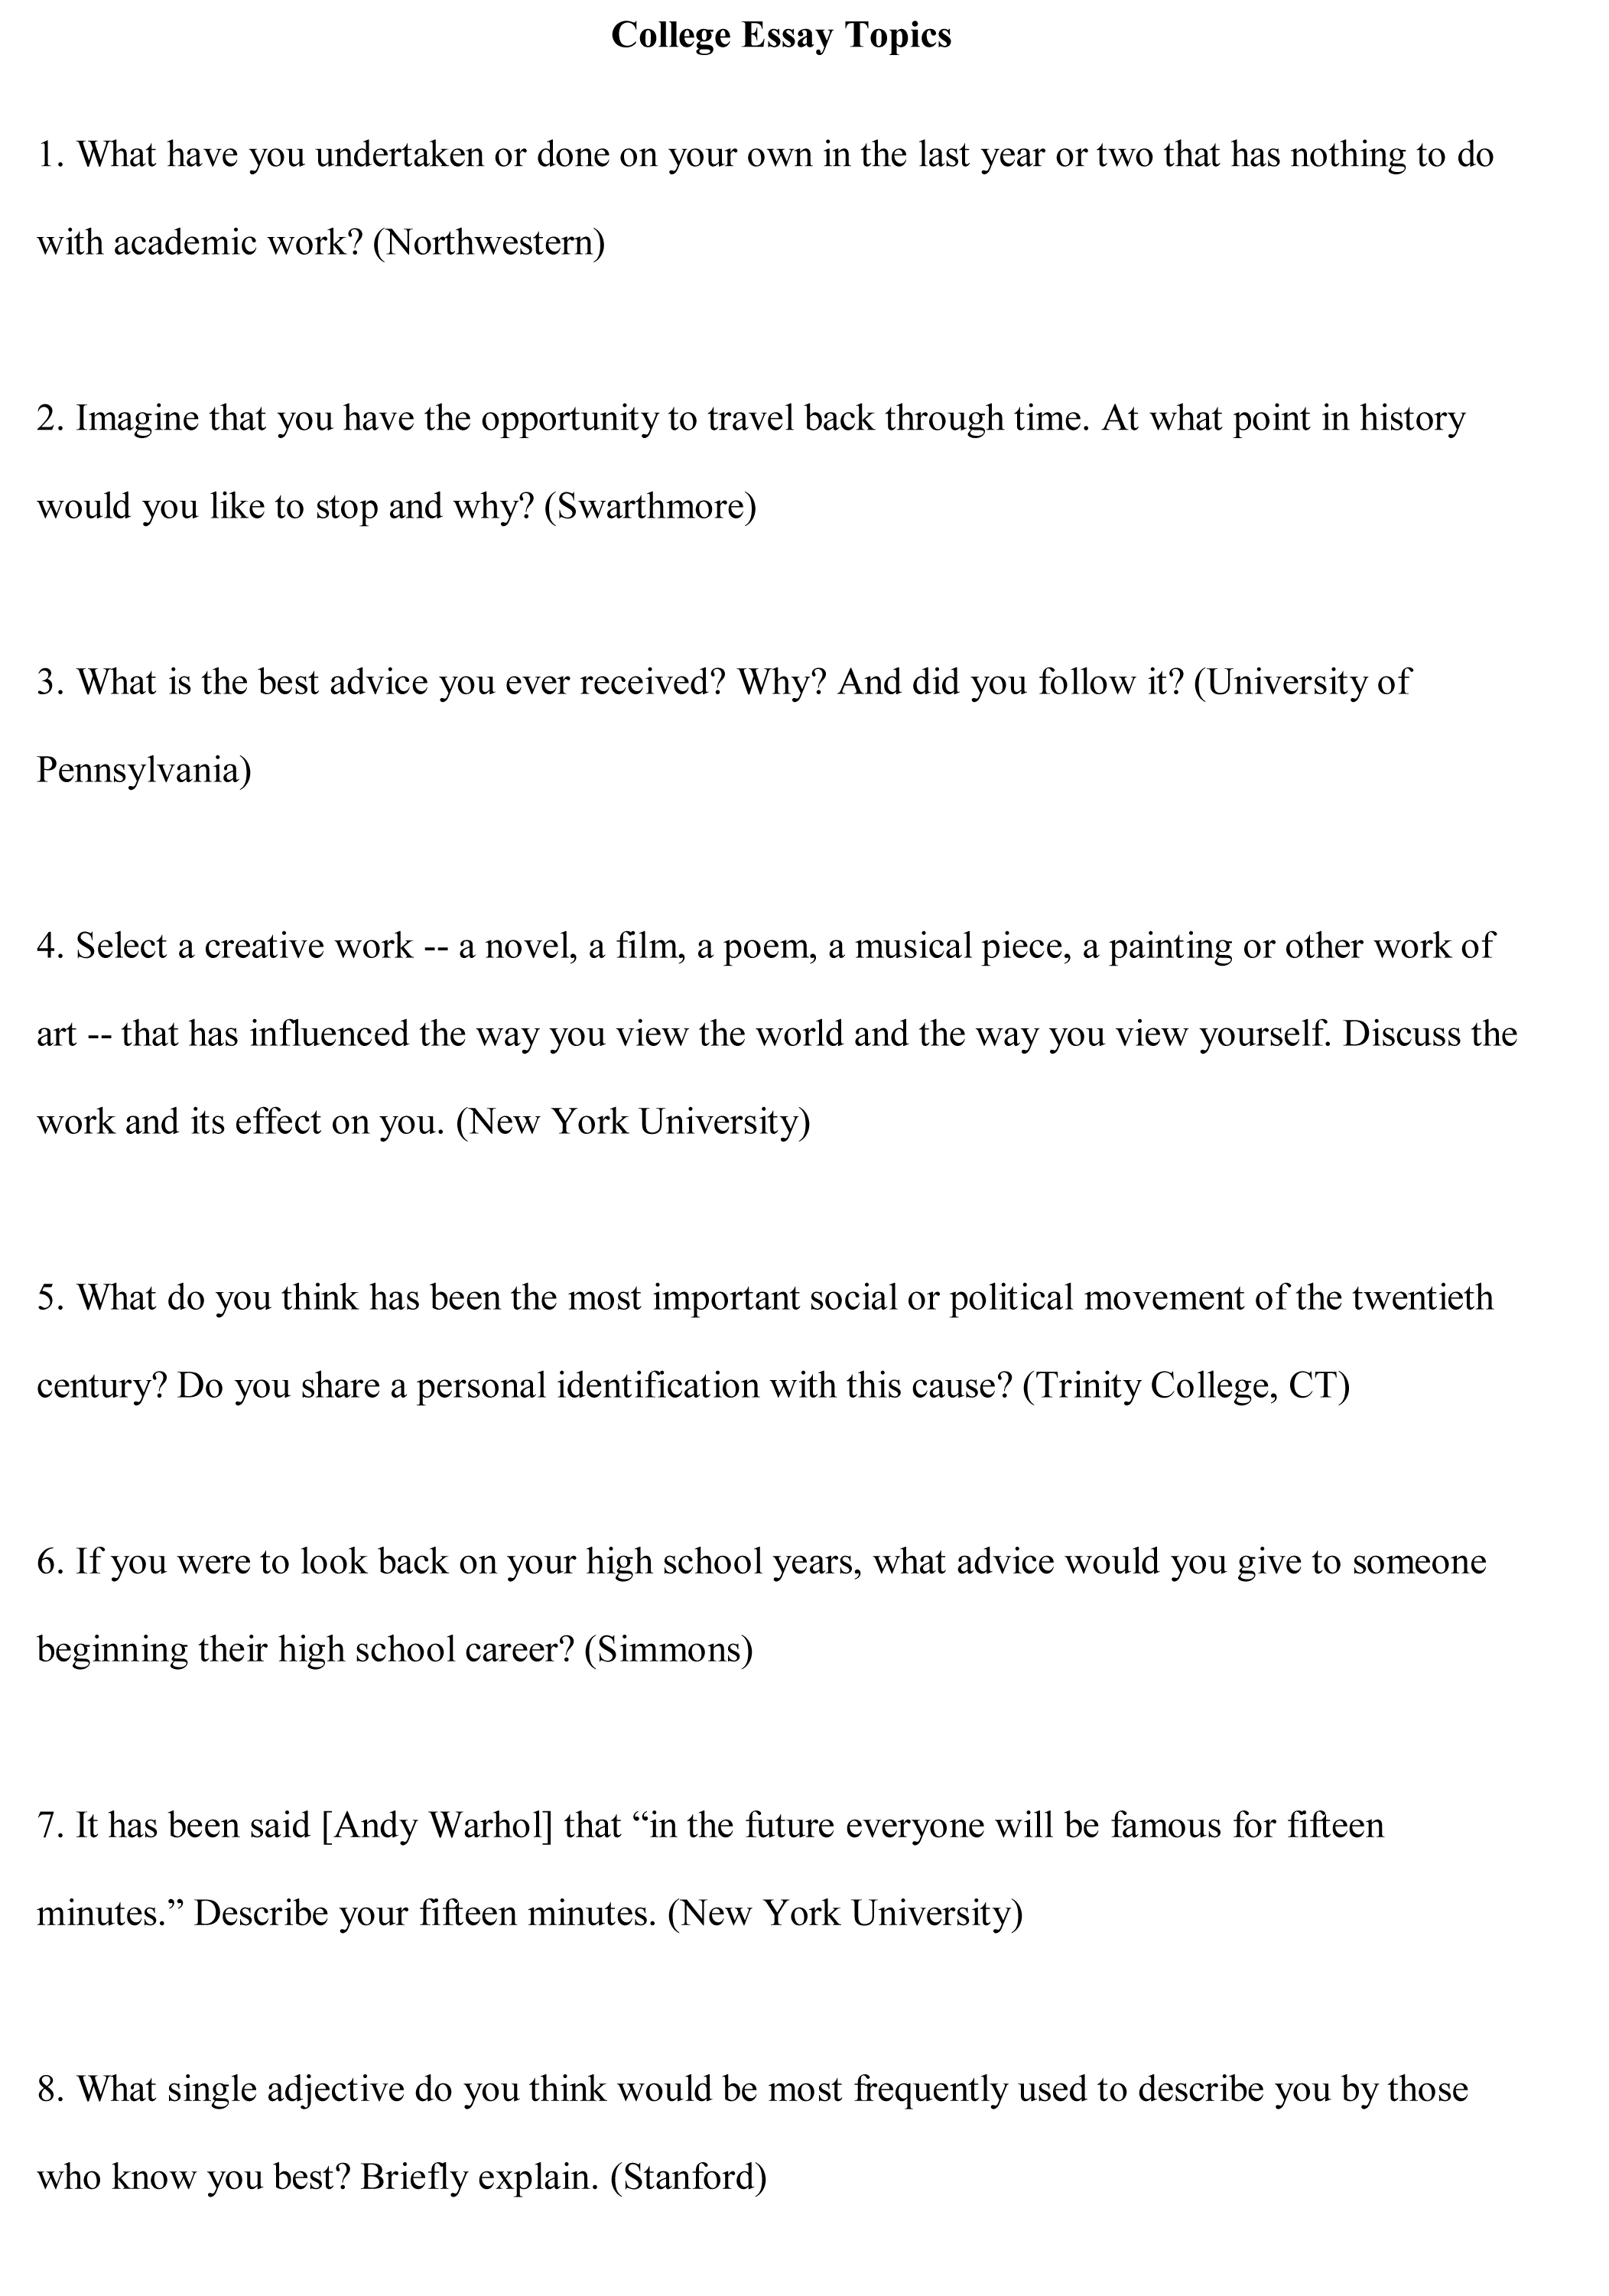 017 College Essay Topics Free Sample1 Good Persuasive Amazing 2018 Uk Argumentative High School Full